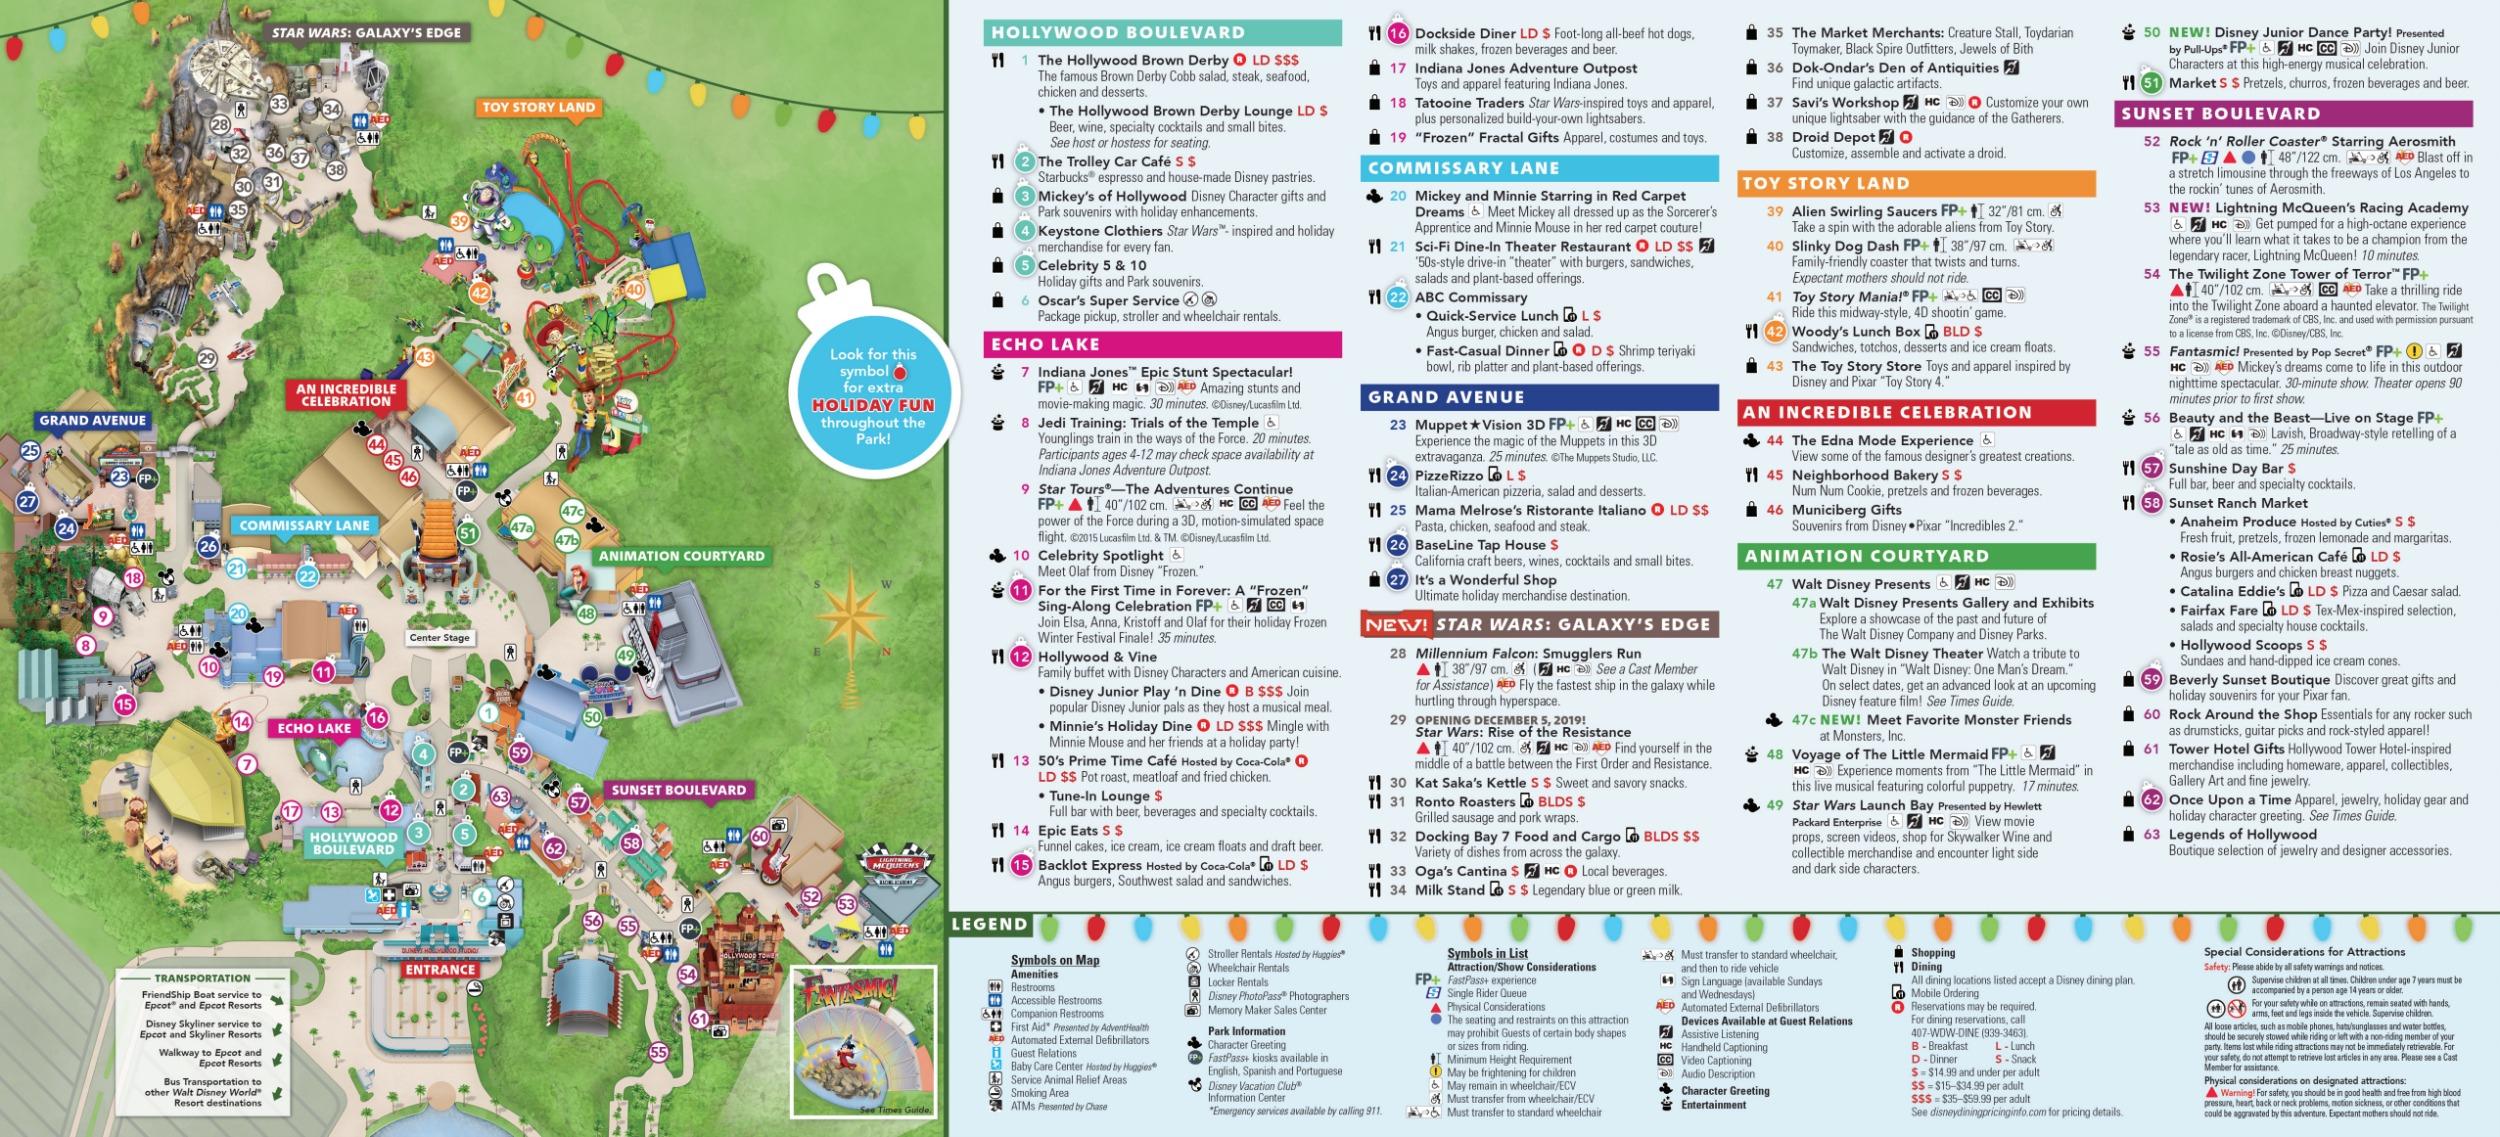 Disney's Hollywood Studios Map At Walt Disney World